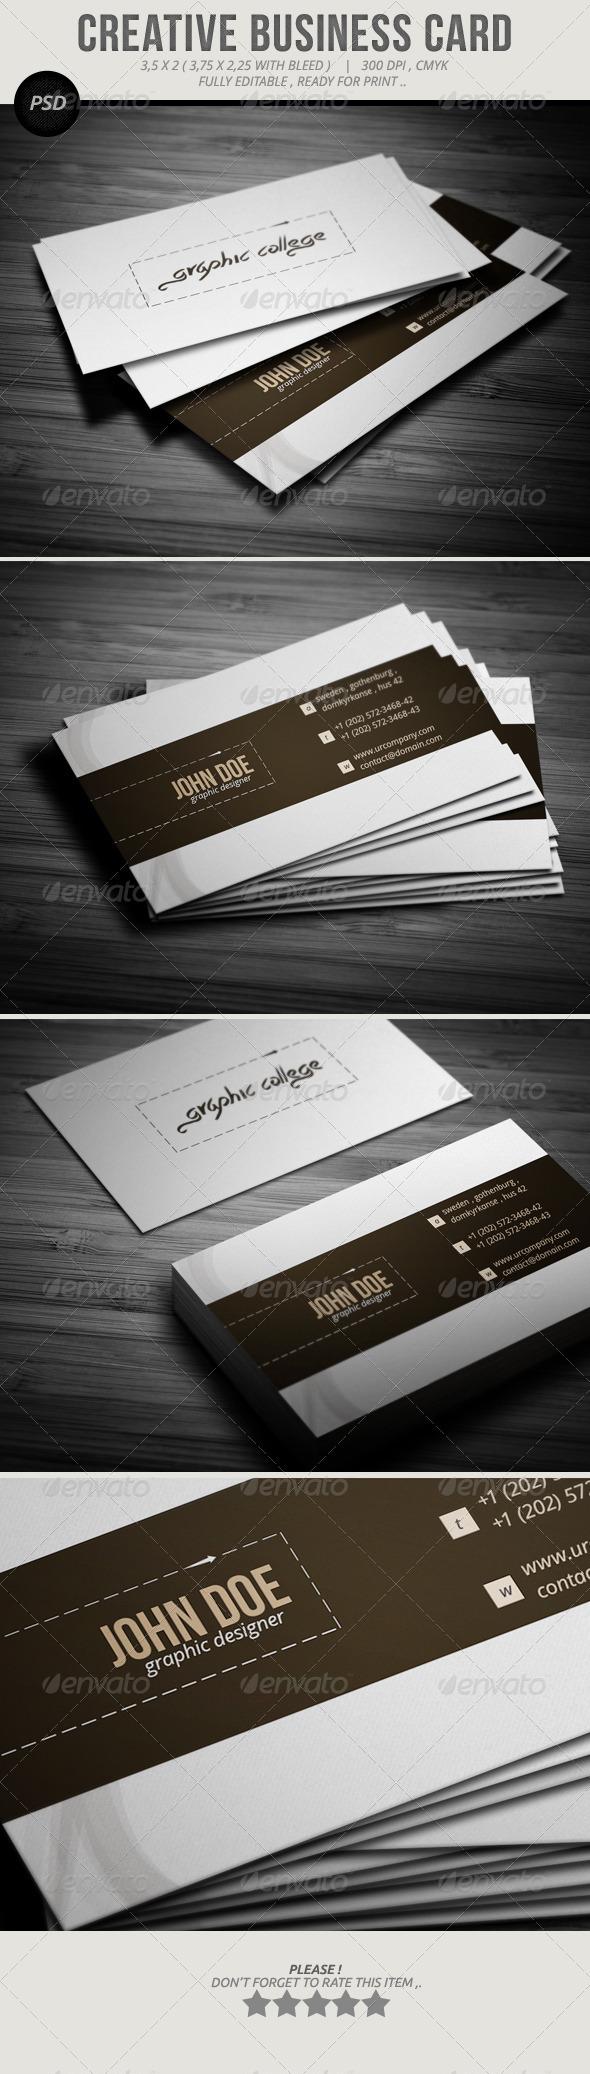 Creative Chin Business Card GraphicRiver u the file include PSD